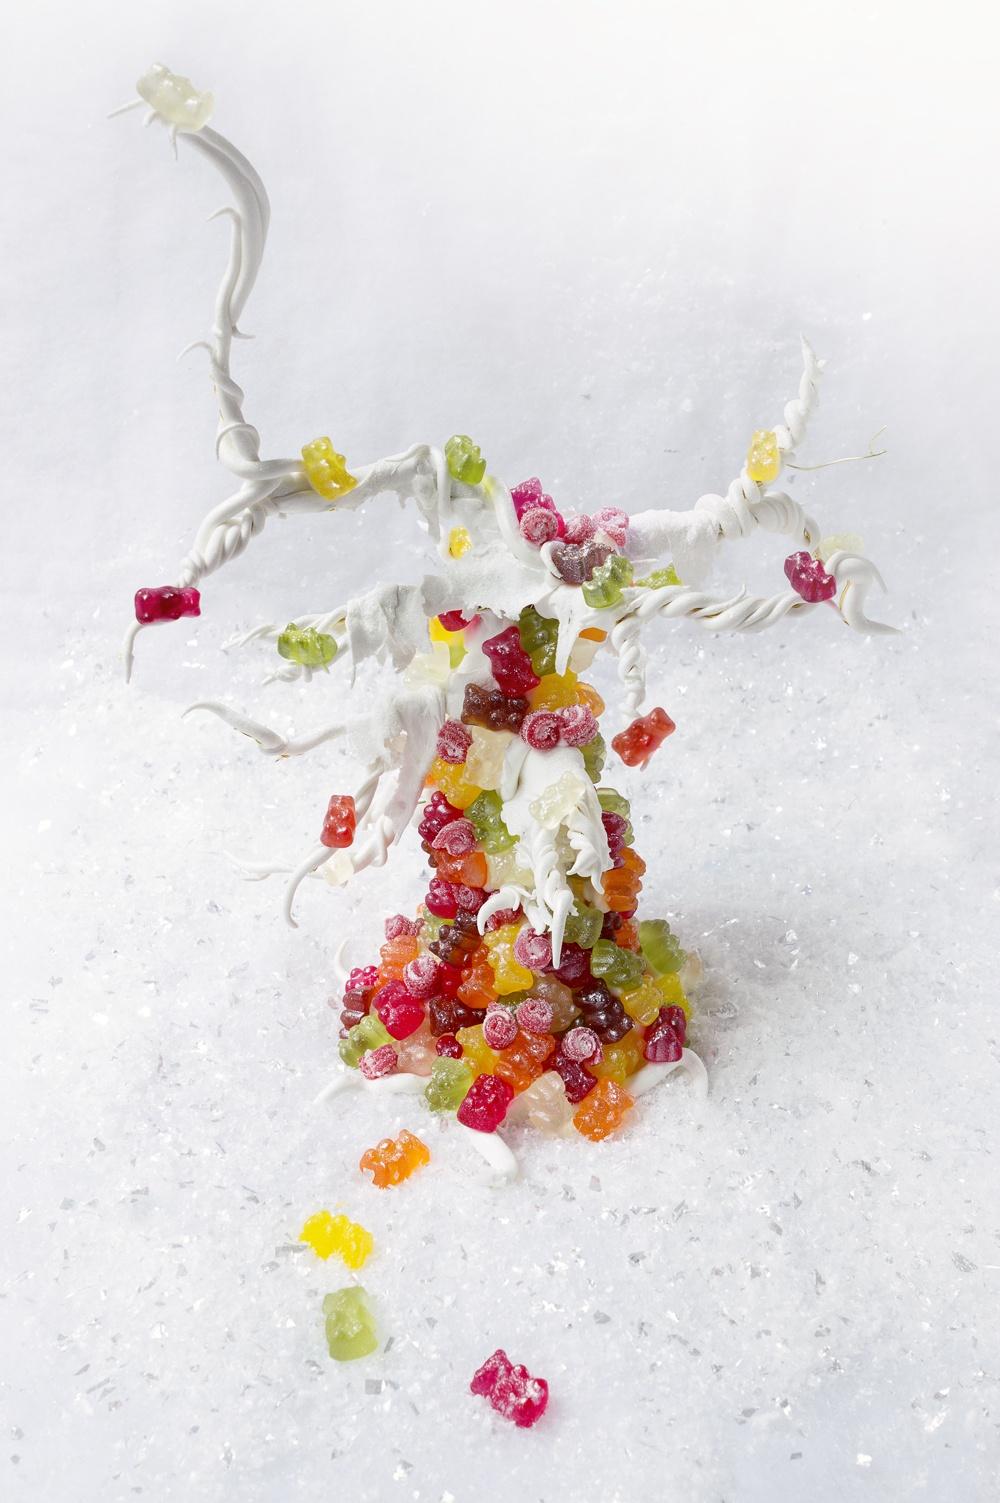 L'arbre à bonbons - Candy Tree - Studio de création - Qui a vole les tartes